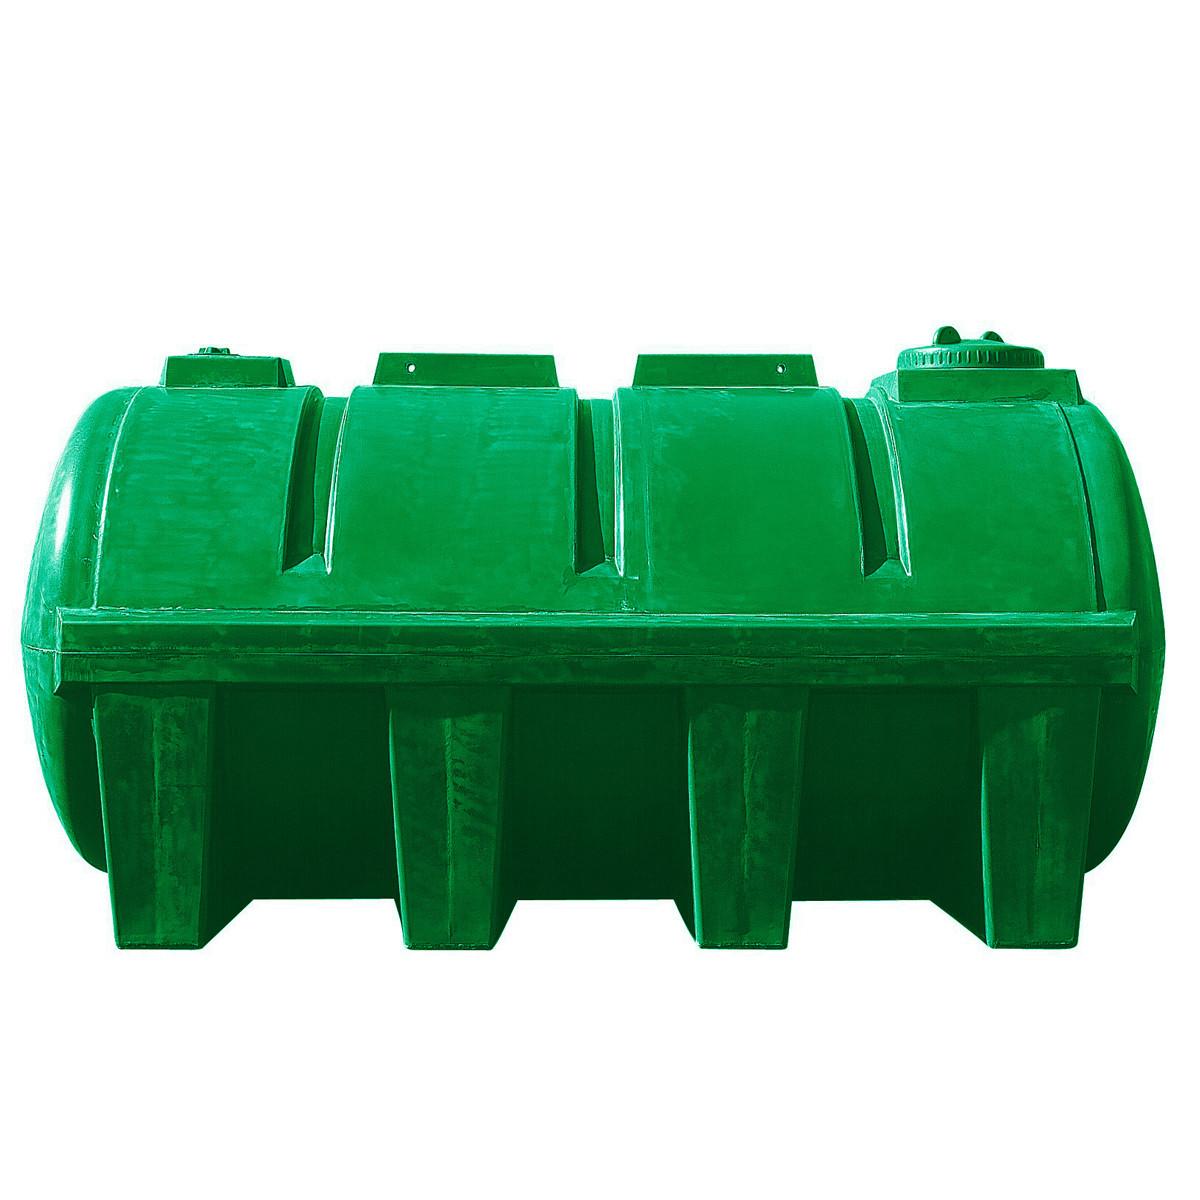 B216 - 5600 litres tank citerne